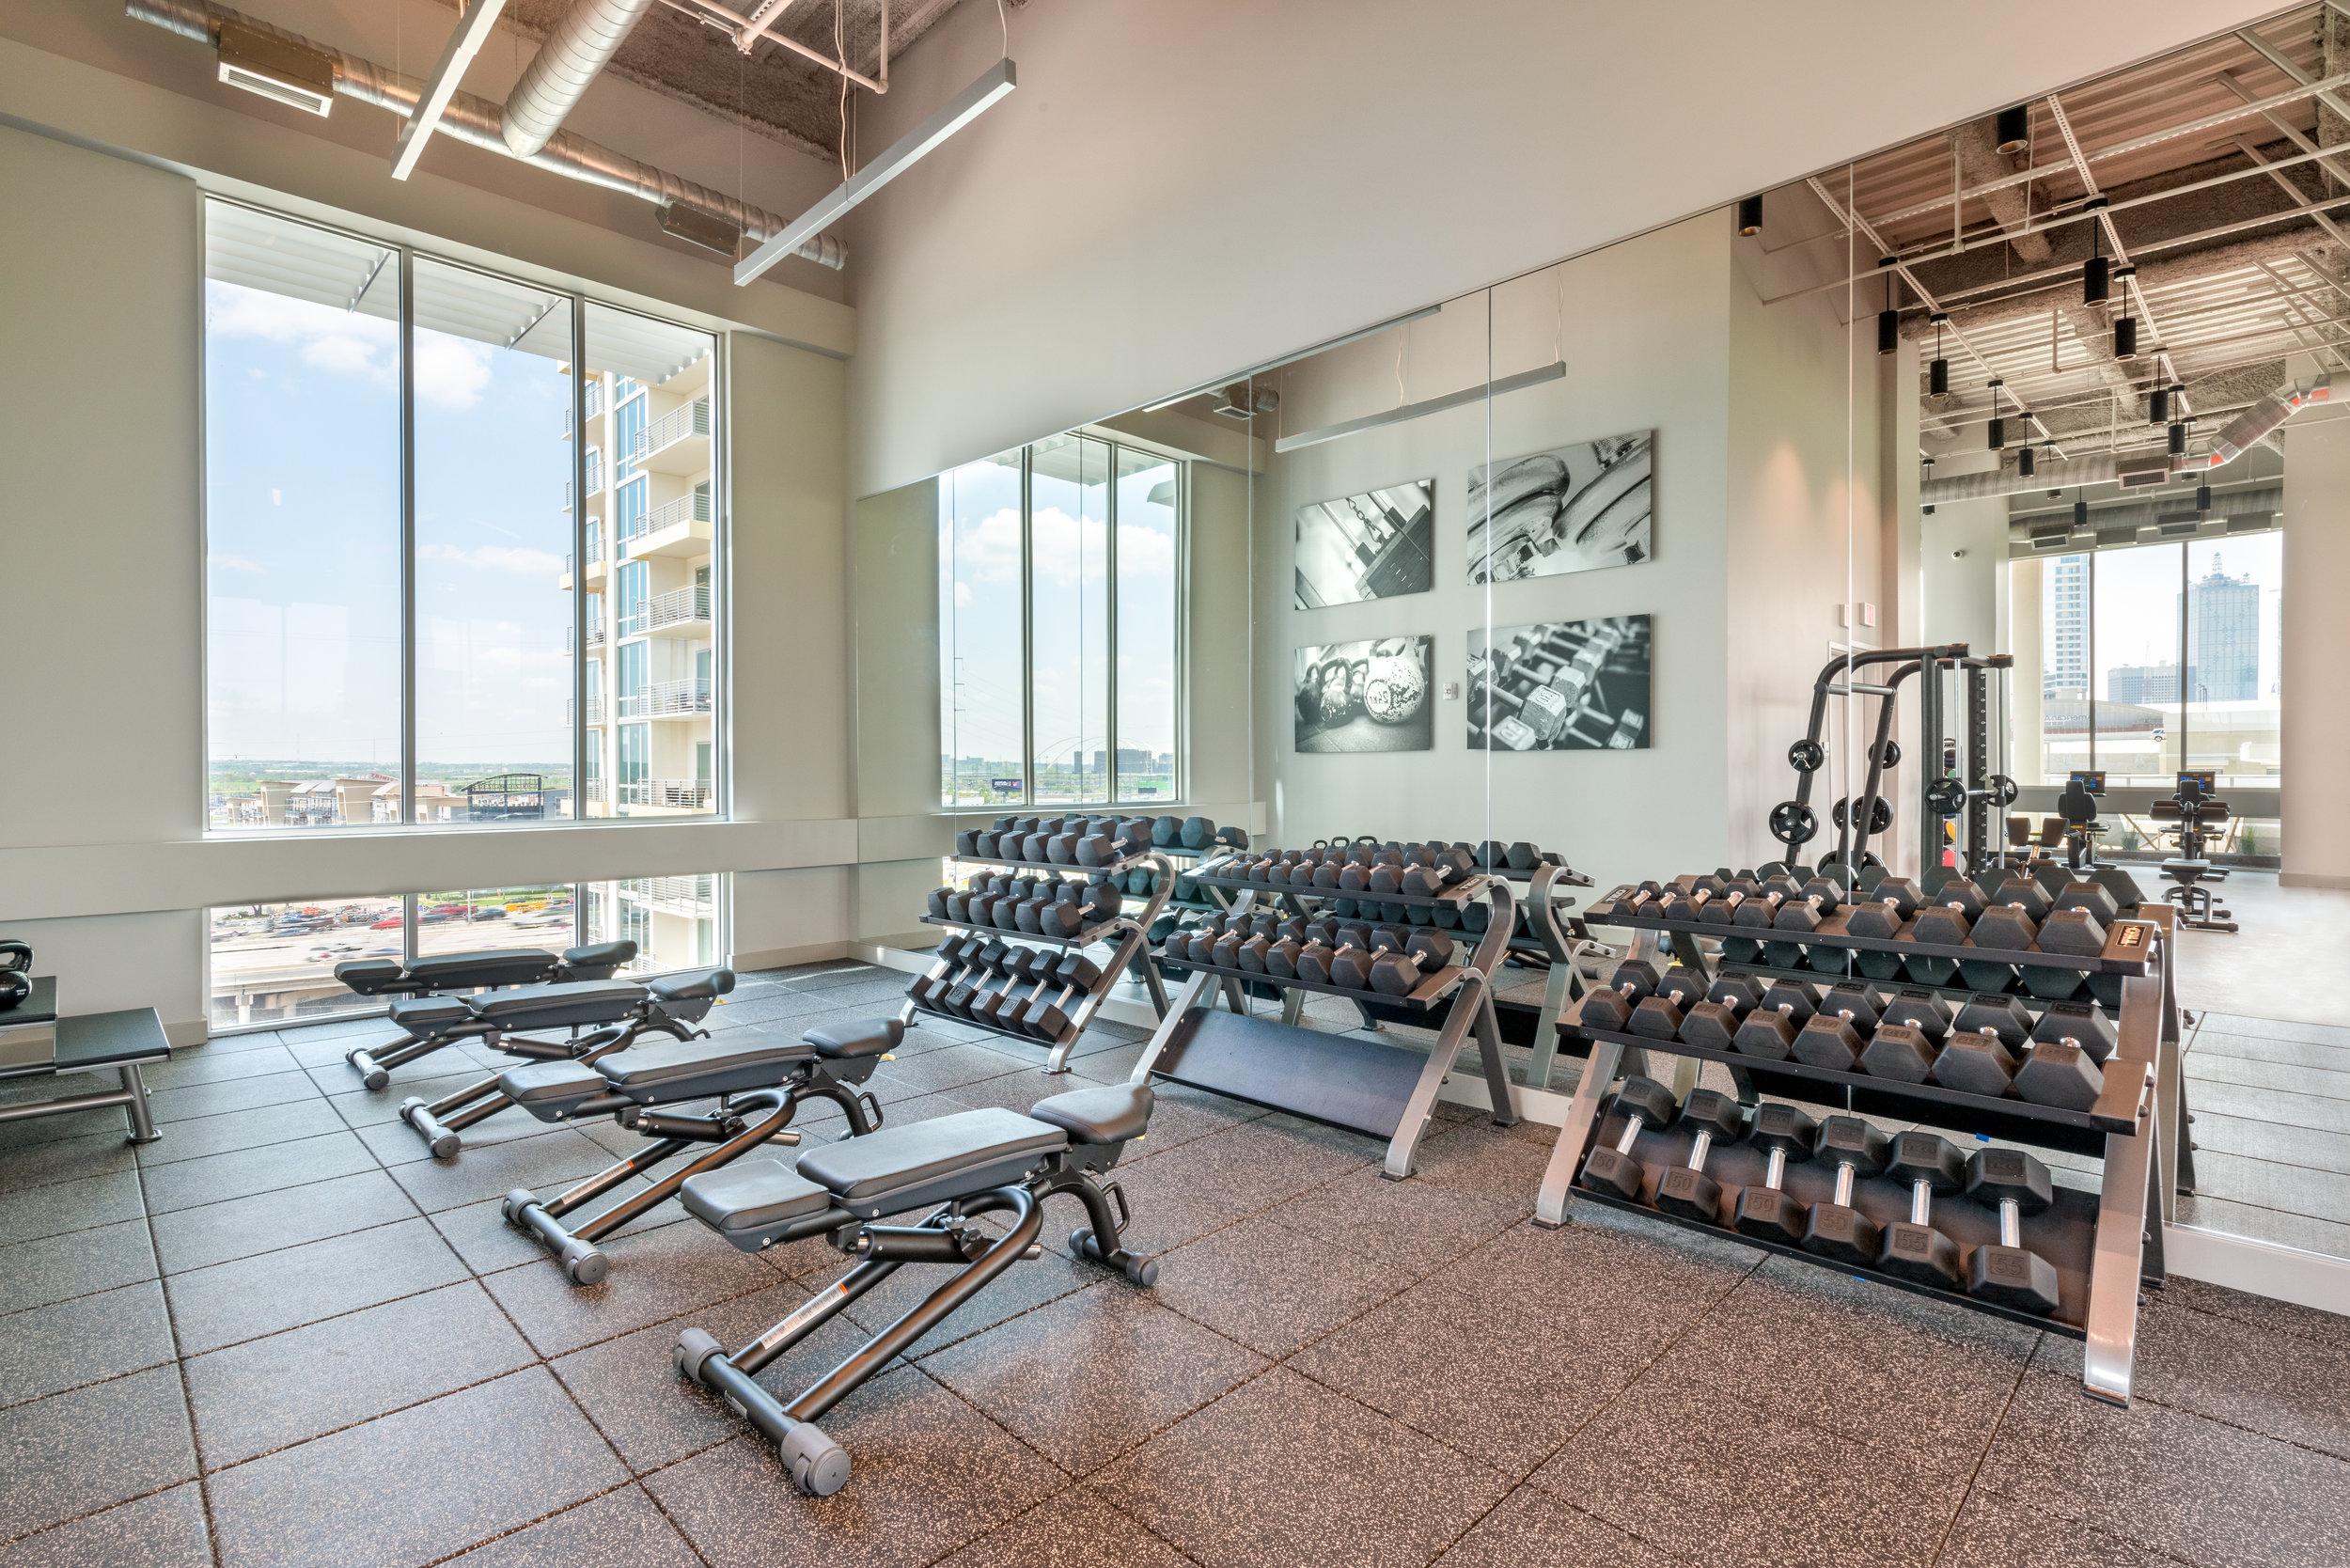 The Katy - Gym 2.jpg